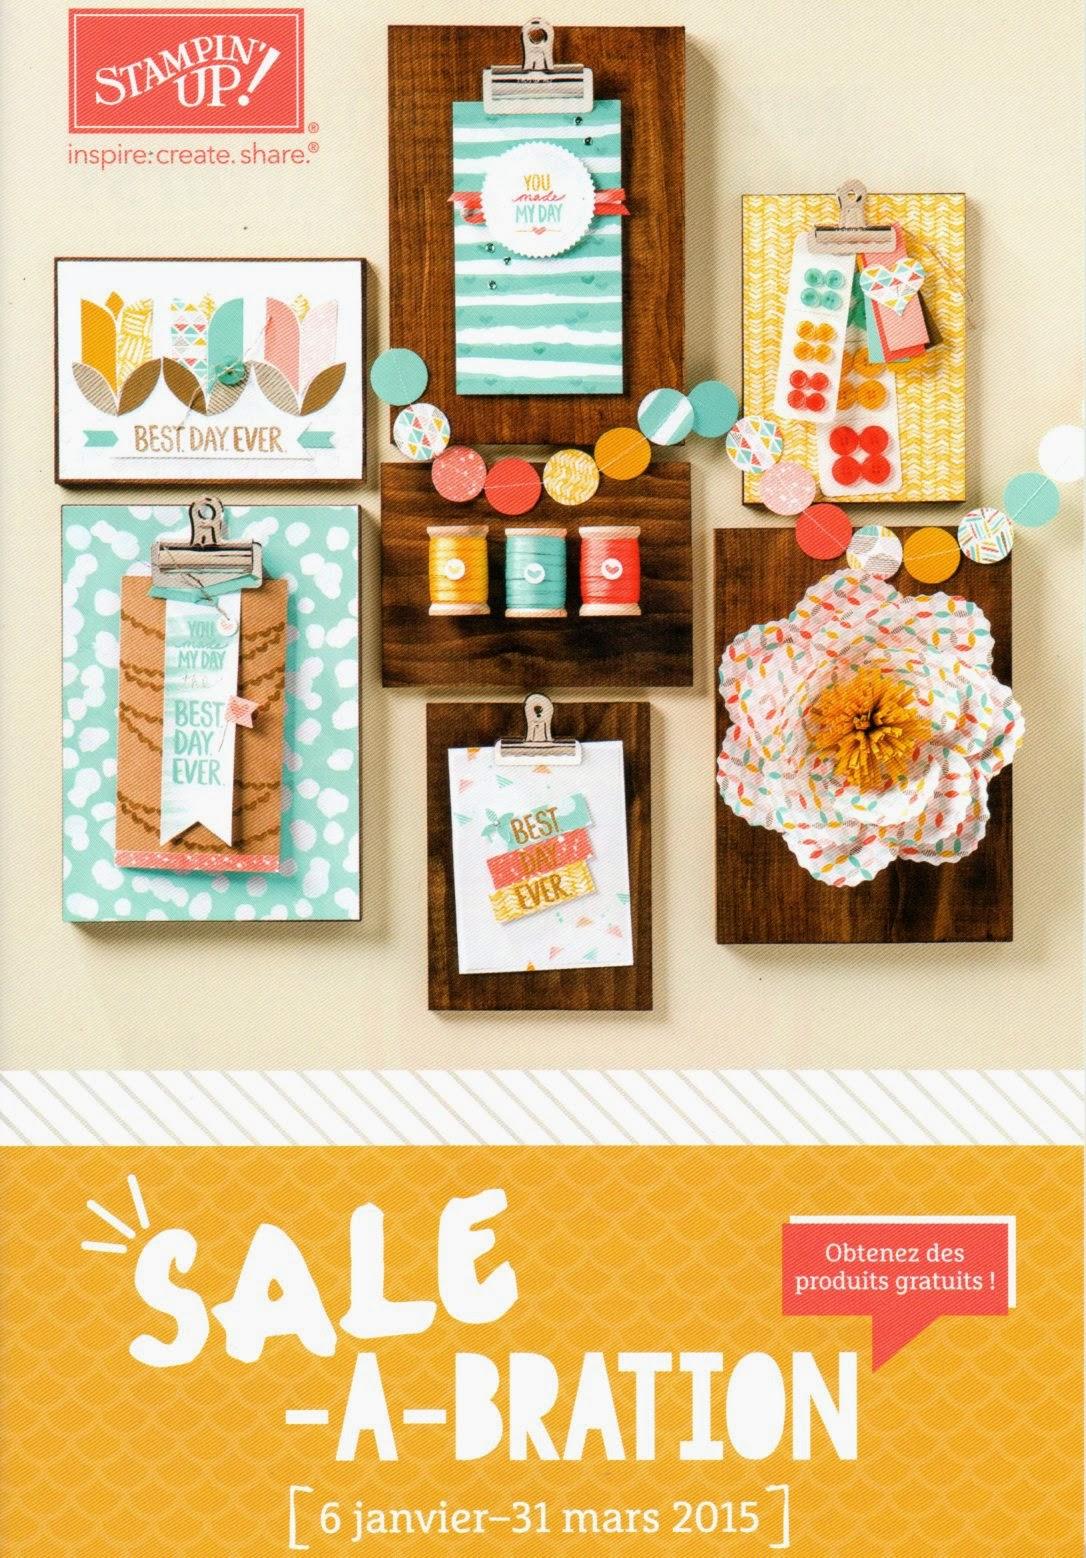 Promotion Sale-A-Bration